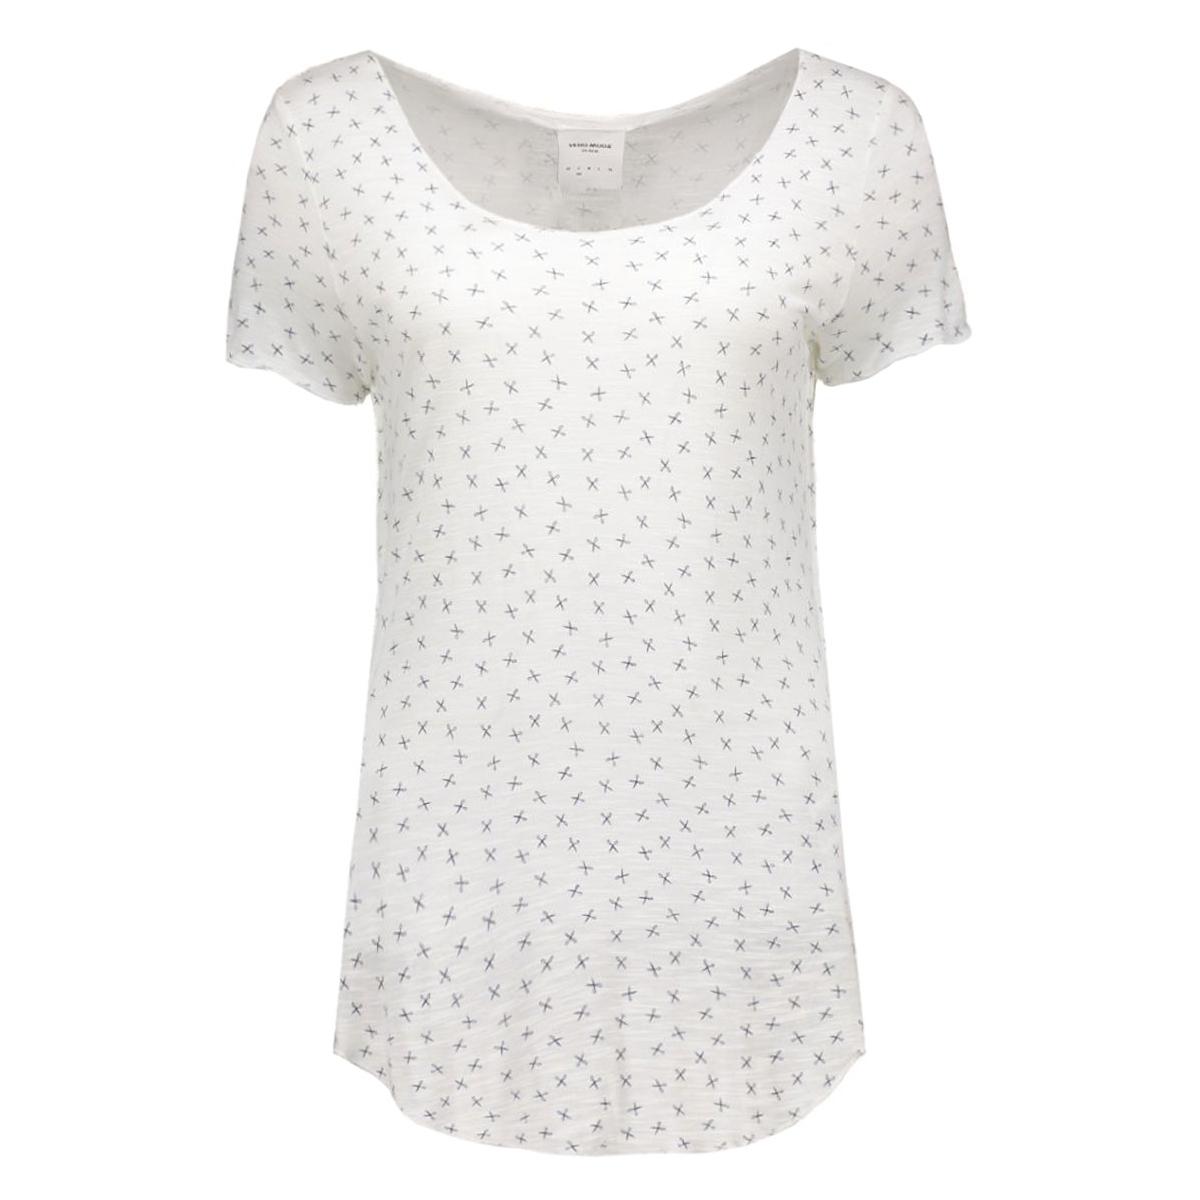 vmlua leisa ss top box dnm jrs 10161838 vero moda t-shirt snow white/scissor